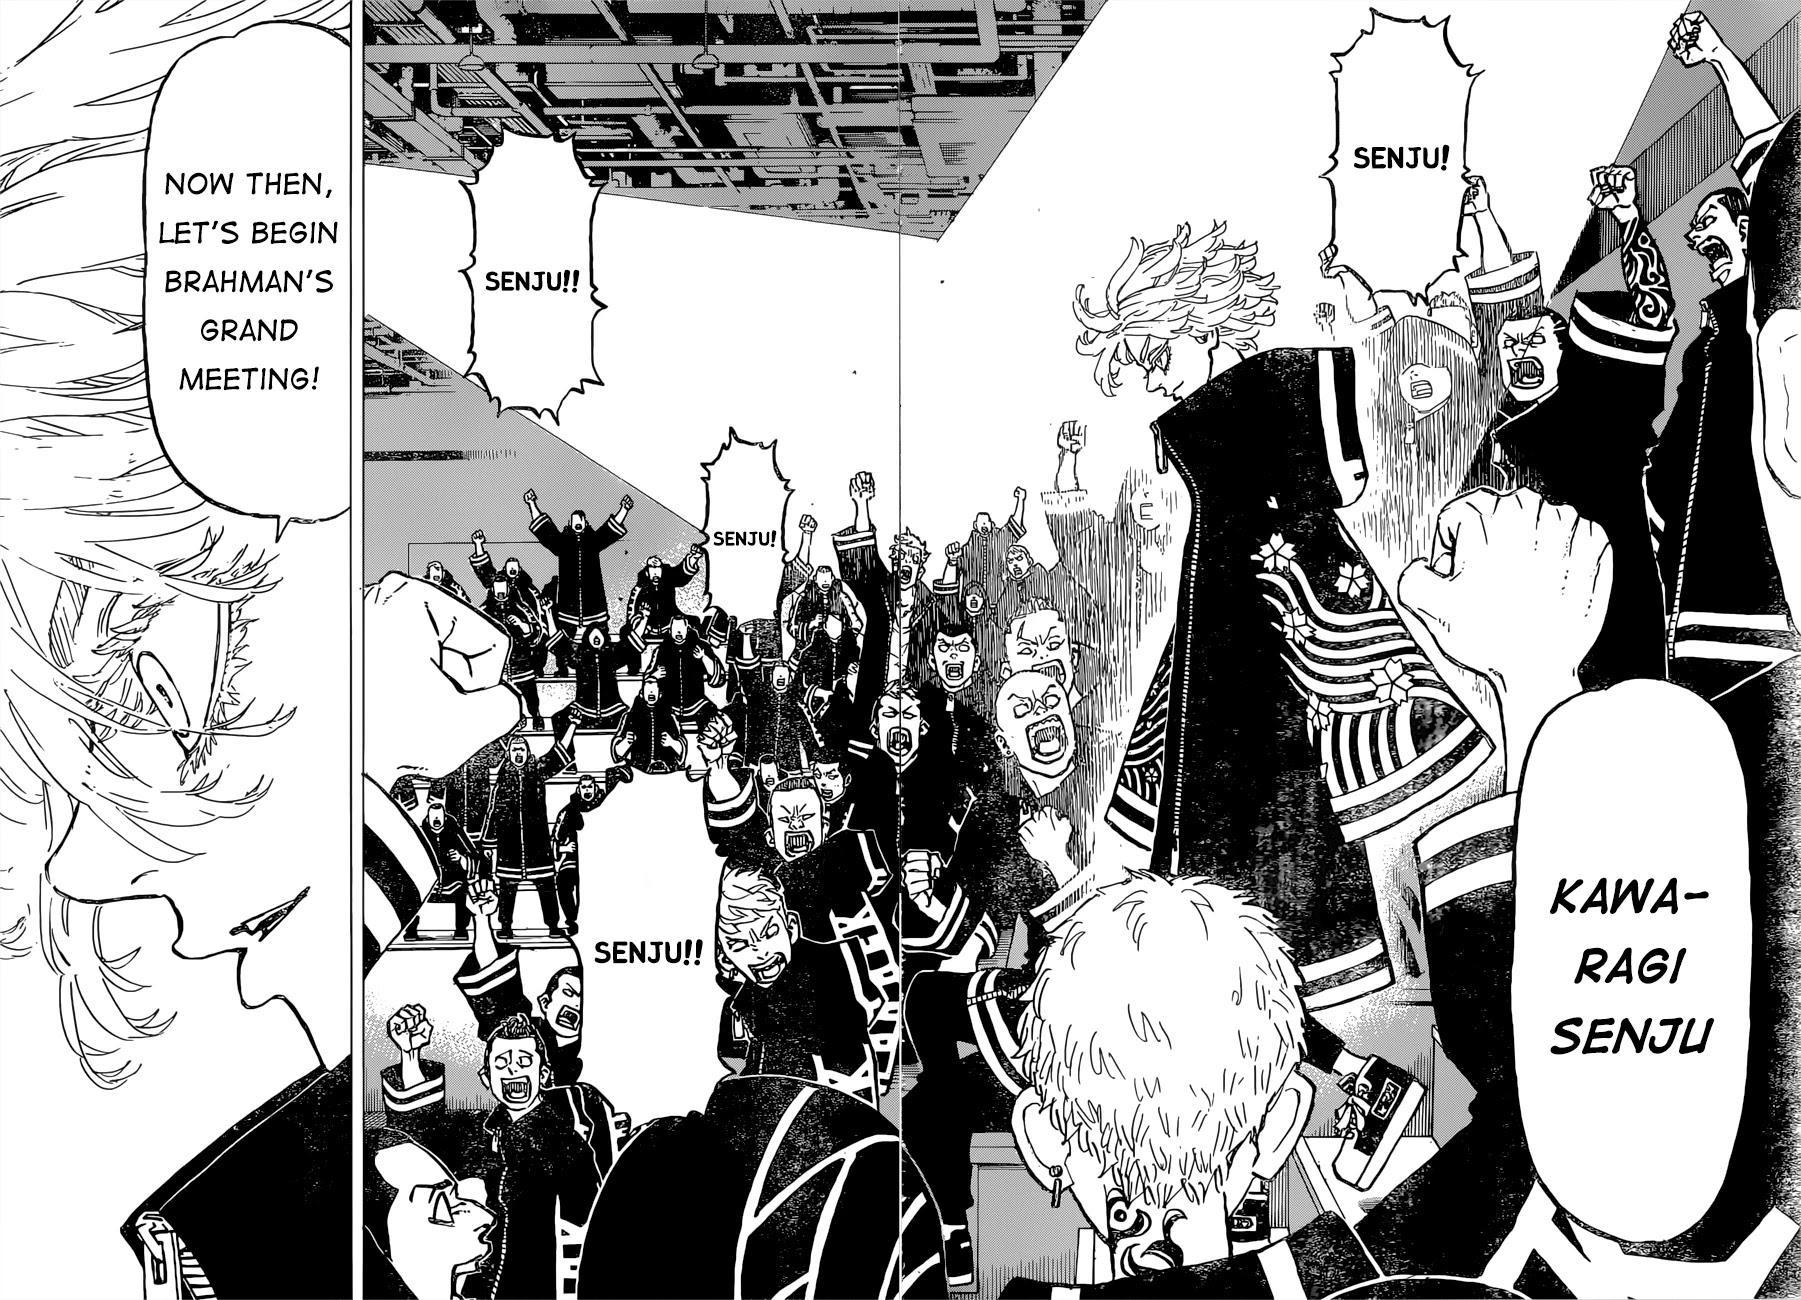 Tokyo Manji Revengers Chapter 218: Queen It Over page 9 - Mangakakalot